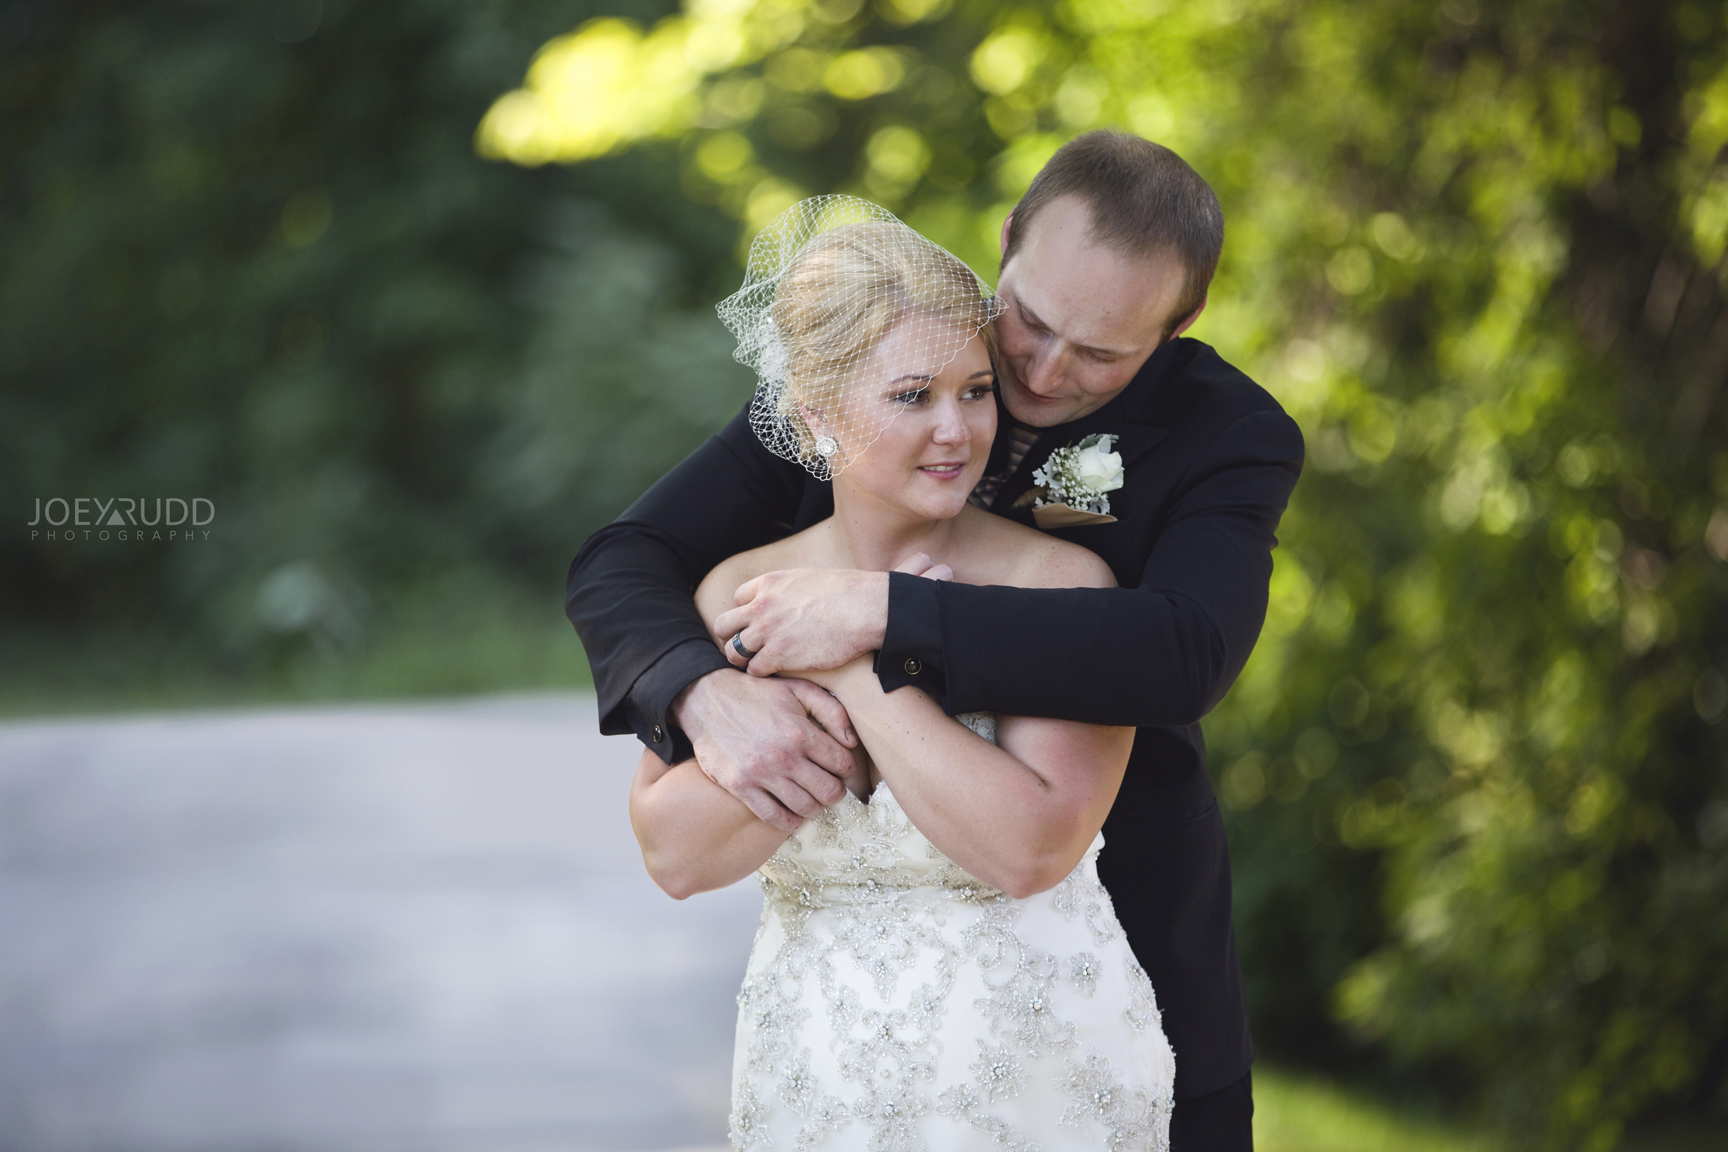 Ottawa Wedding Photography at Strathmere Lodge by Joey Rudd Photography Rustic Elegant Romantic Photo